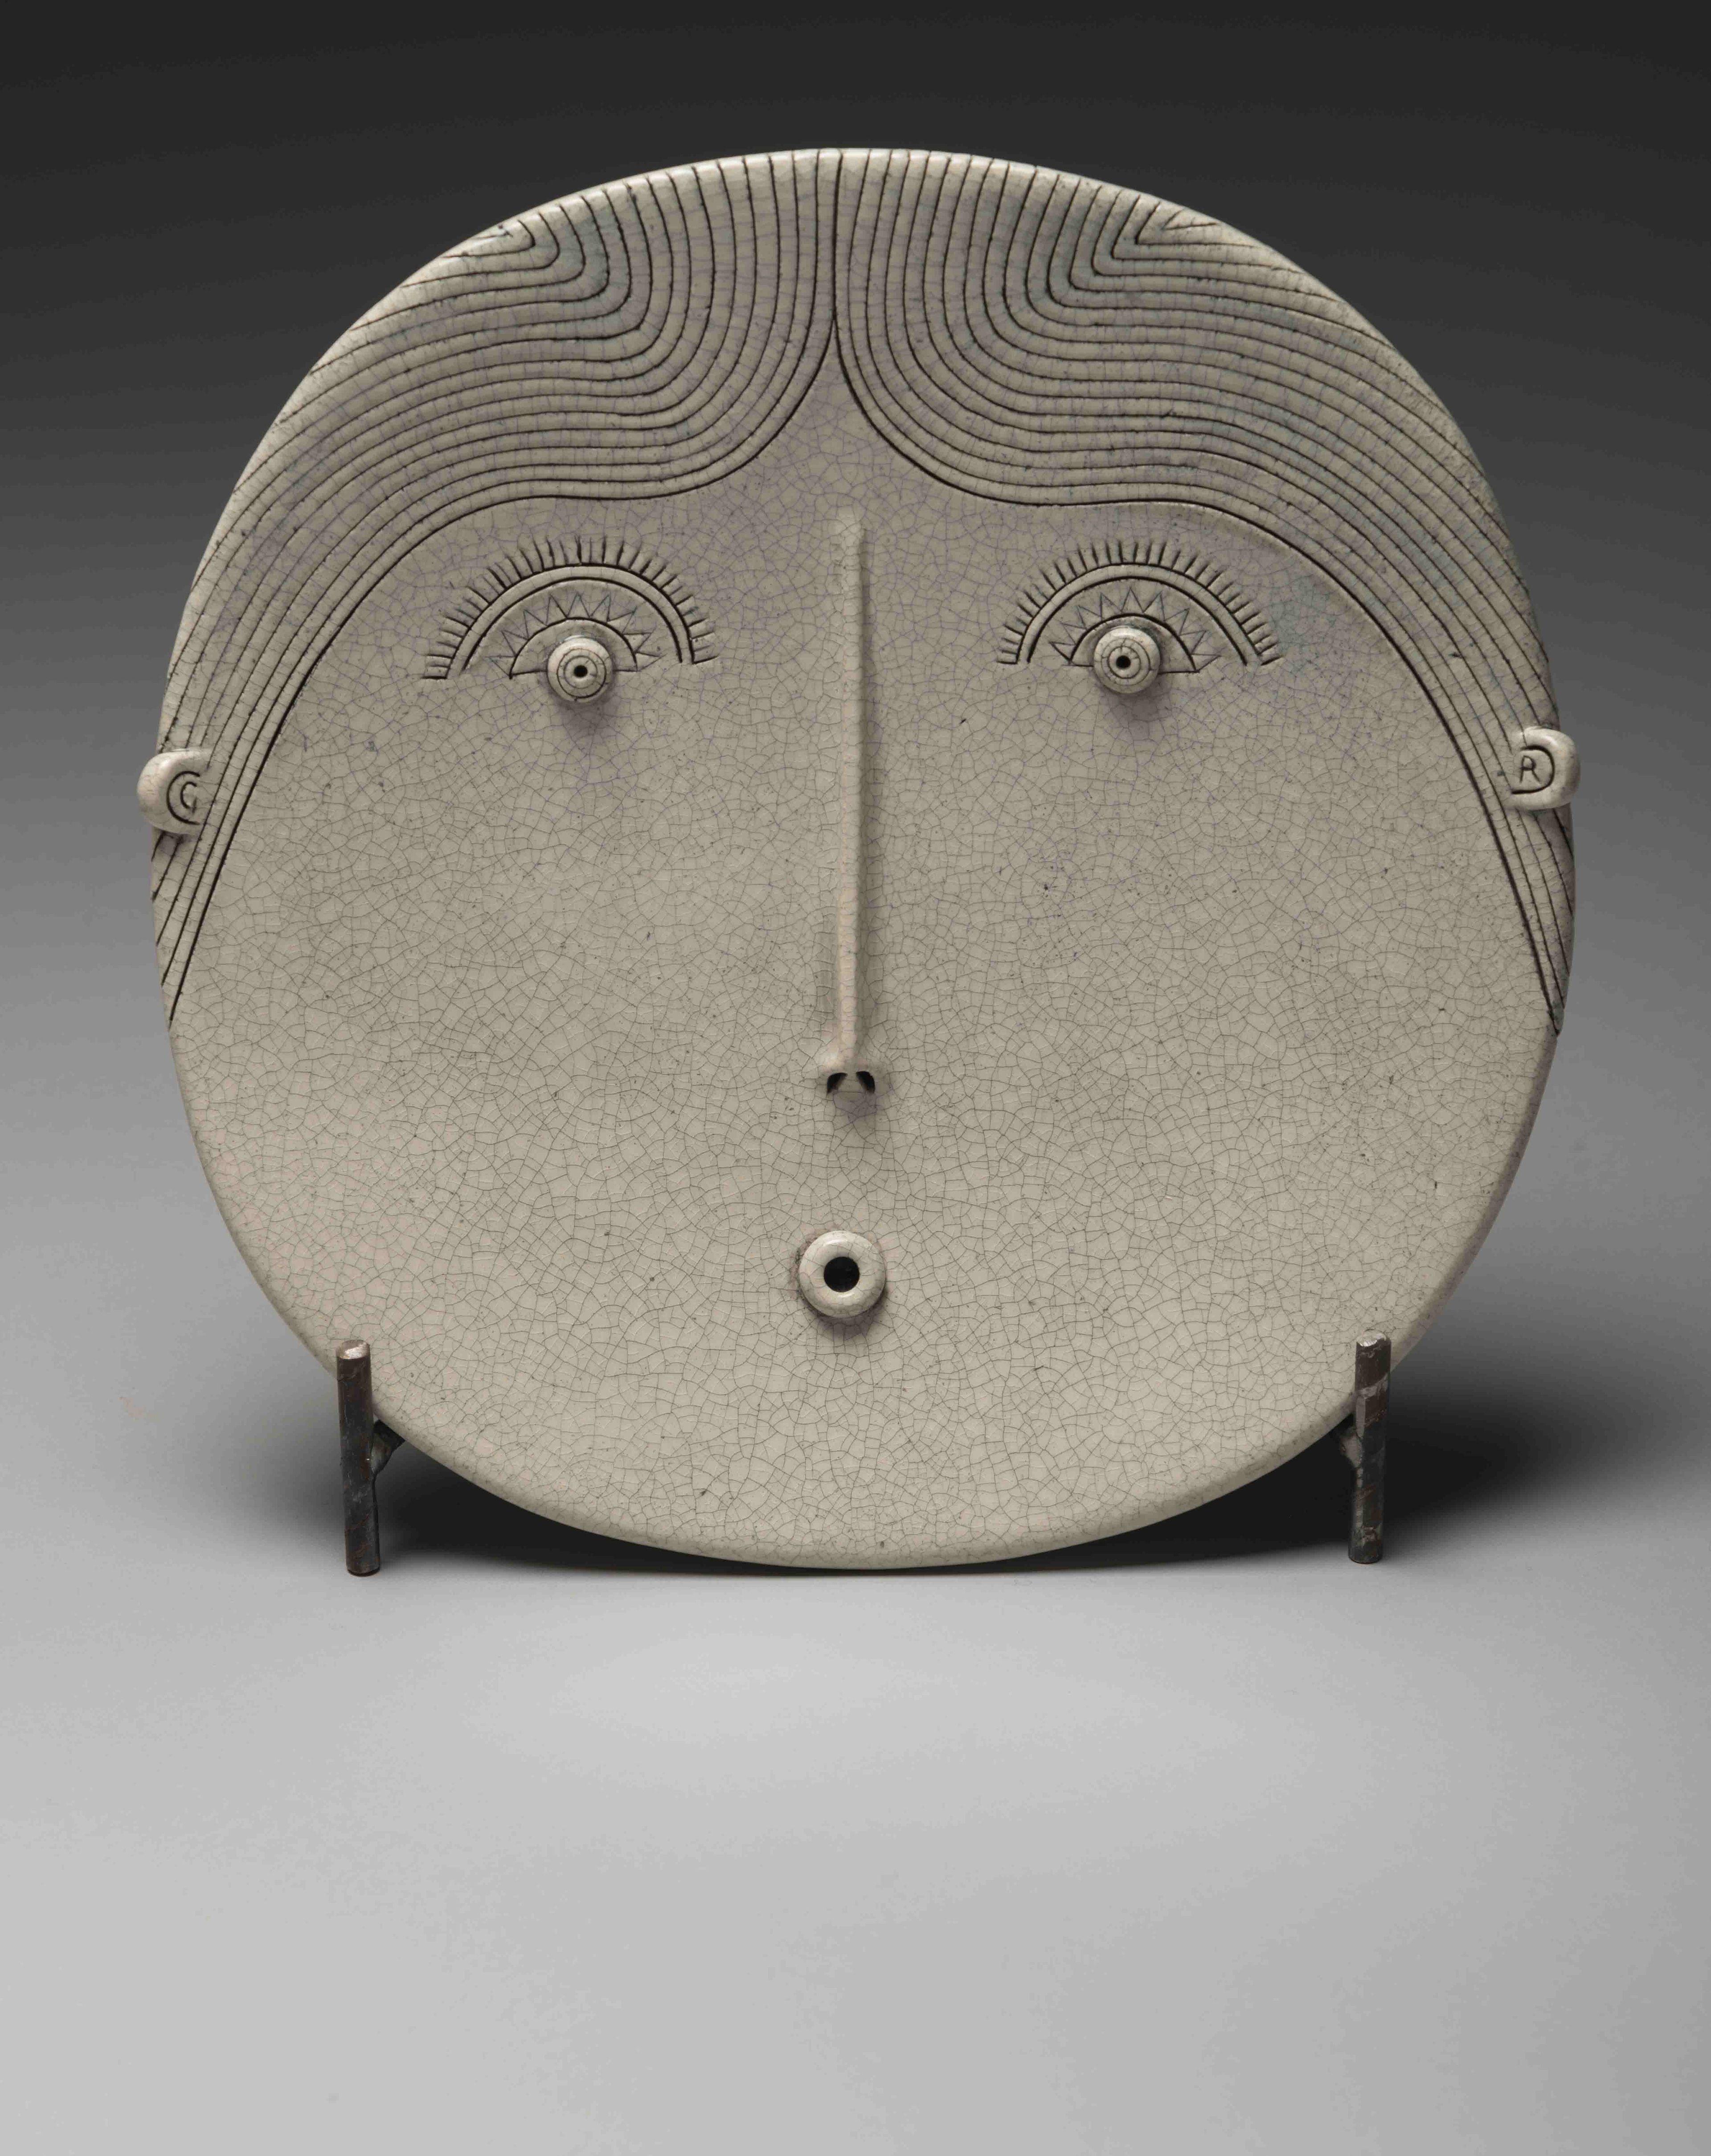 Mann Hans Carrington Pottery Ceramics Pottery Art Pottery Sculpture Beginner Pottery